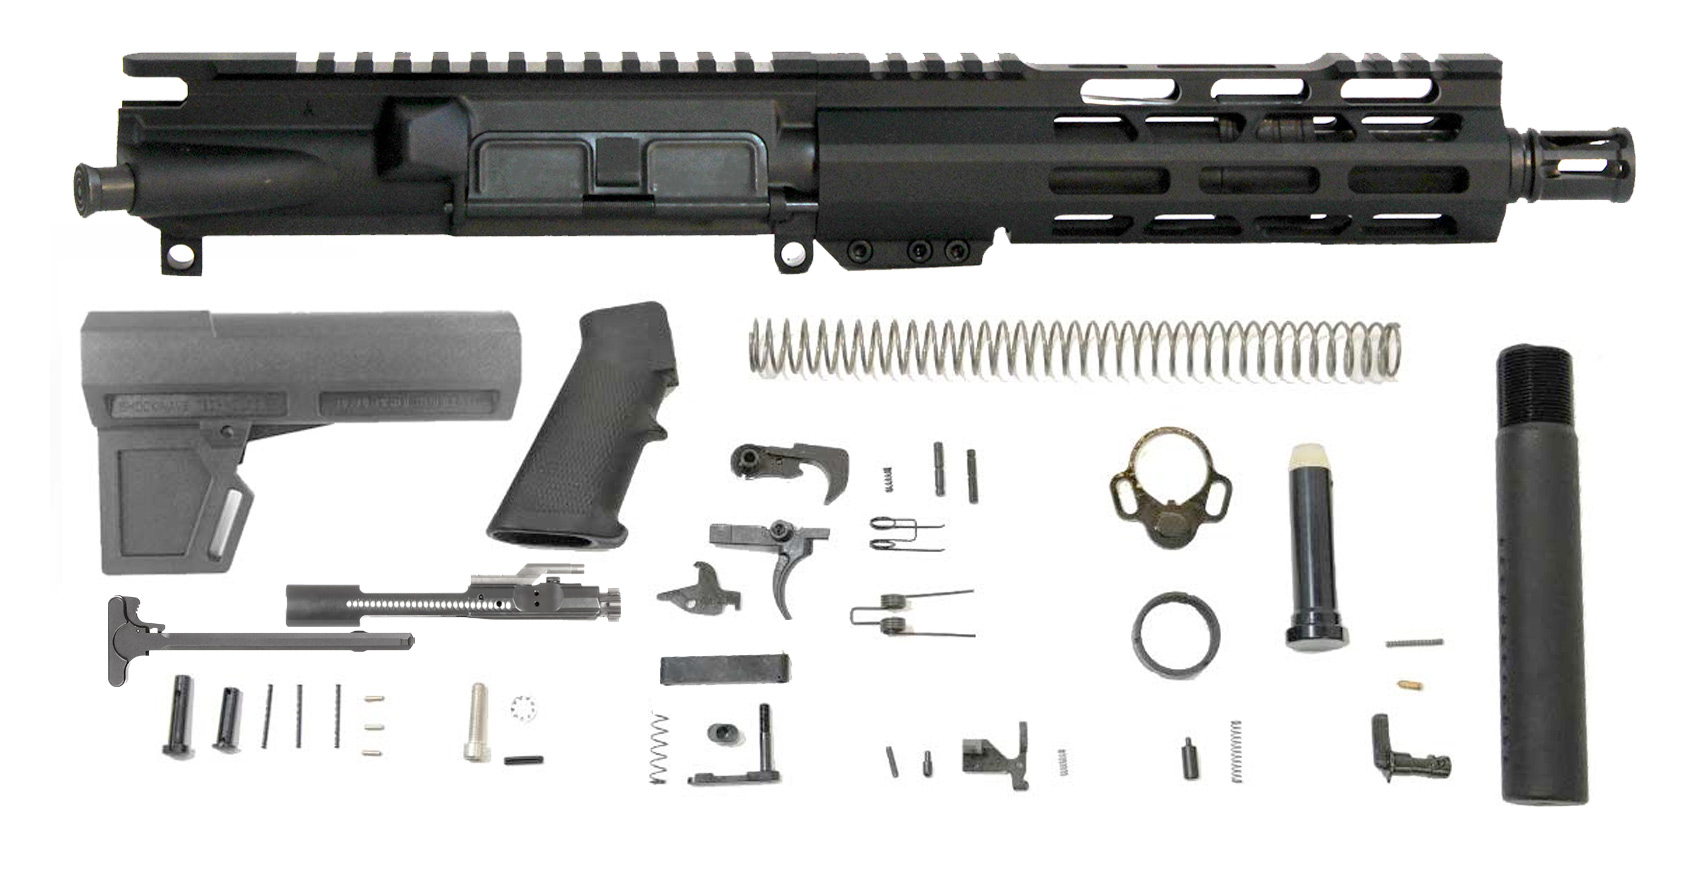 ar15-pistol-kit-7-5-inch-7-62x39-m-lok-shockwave-205508